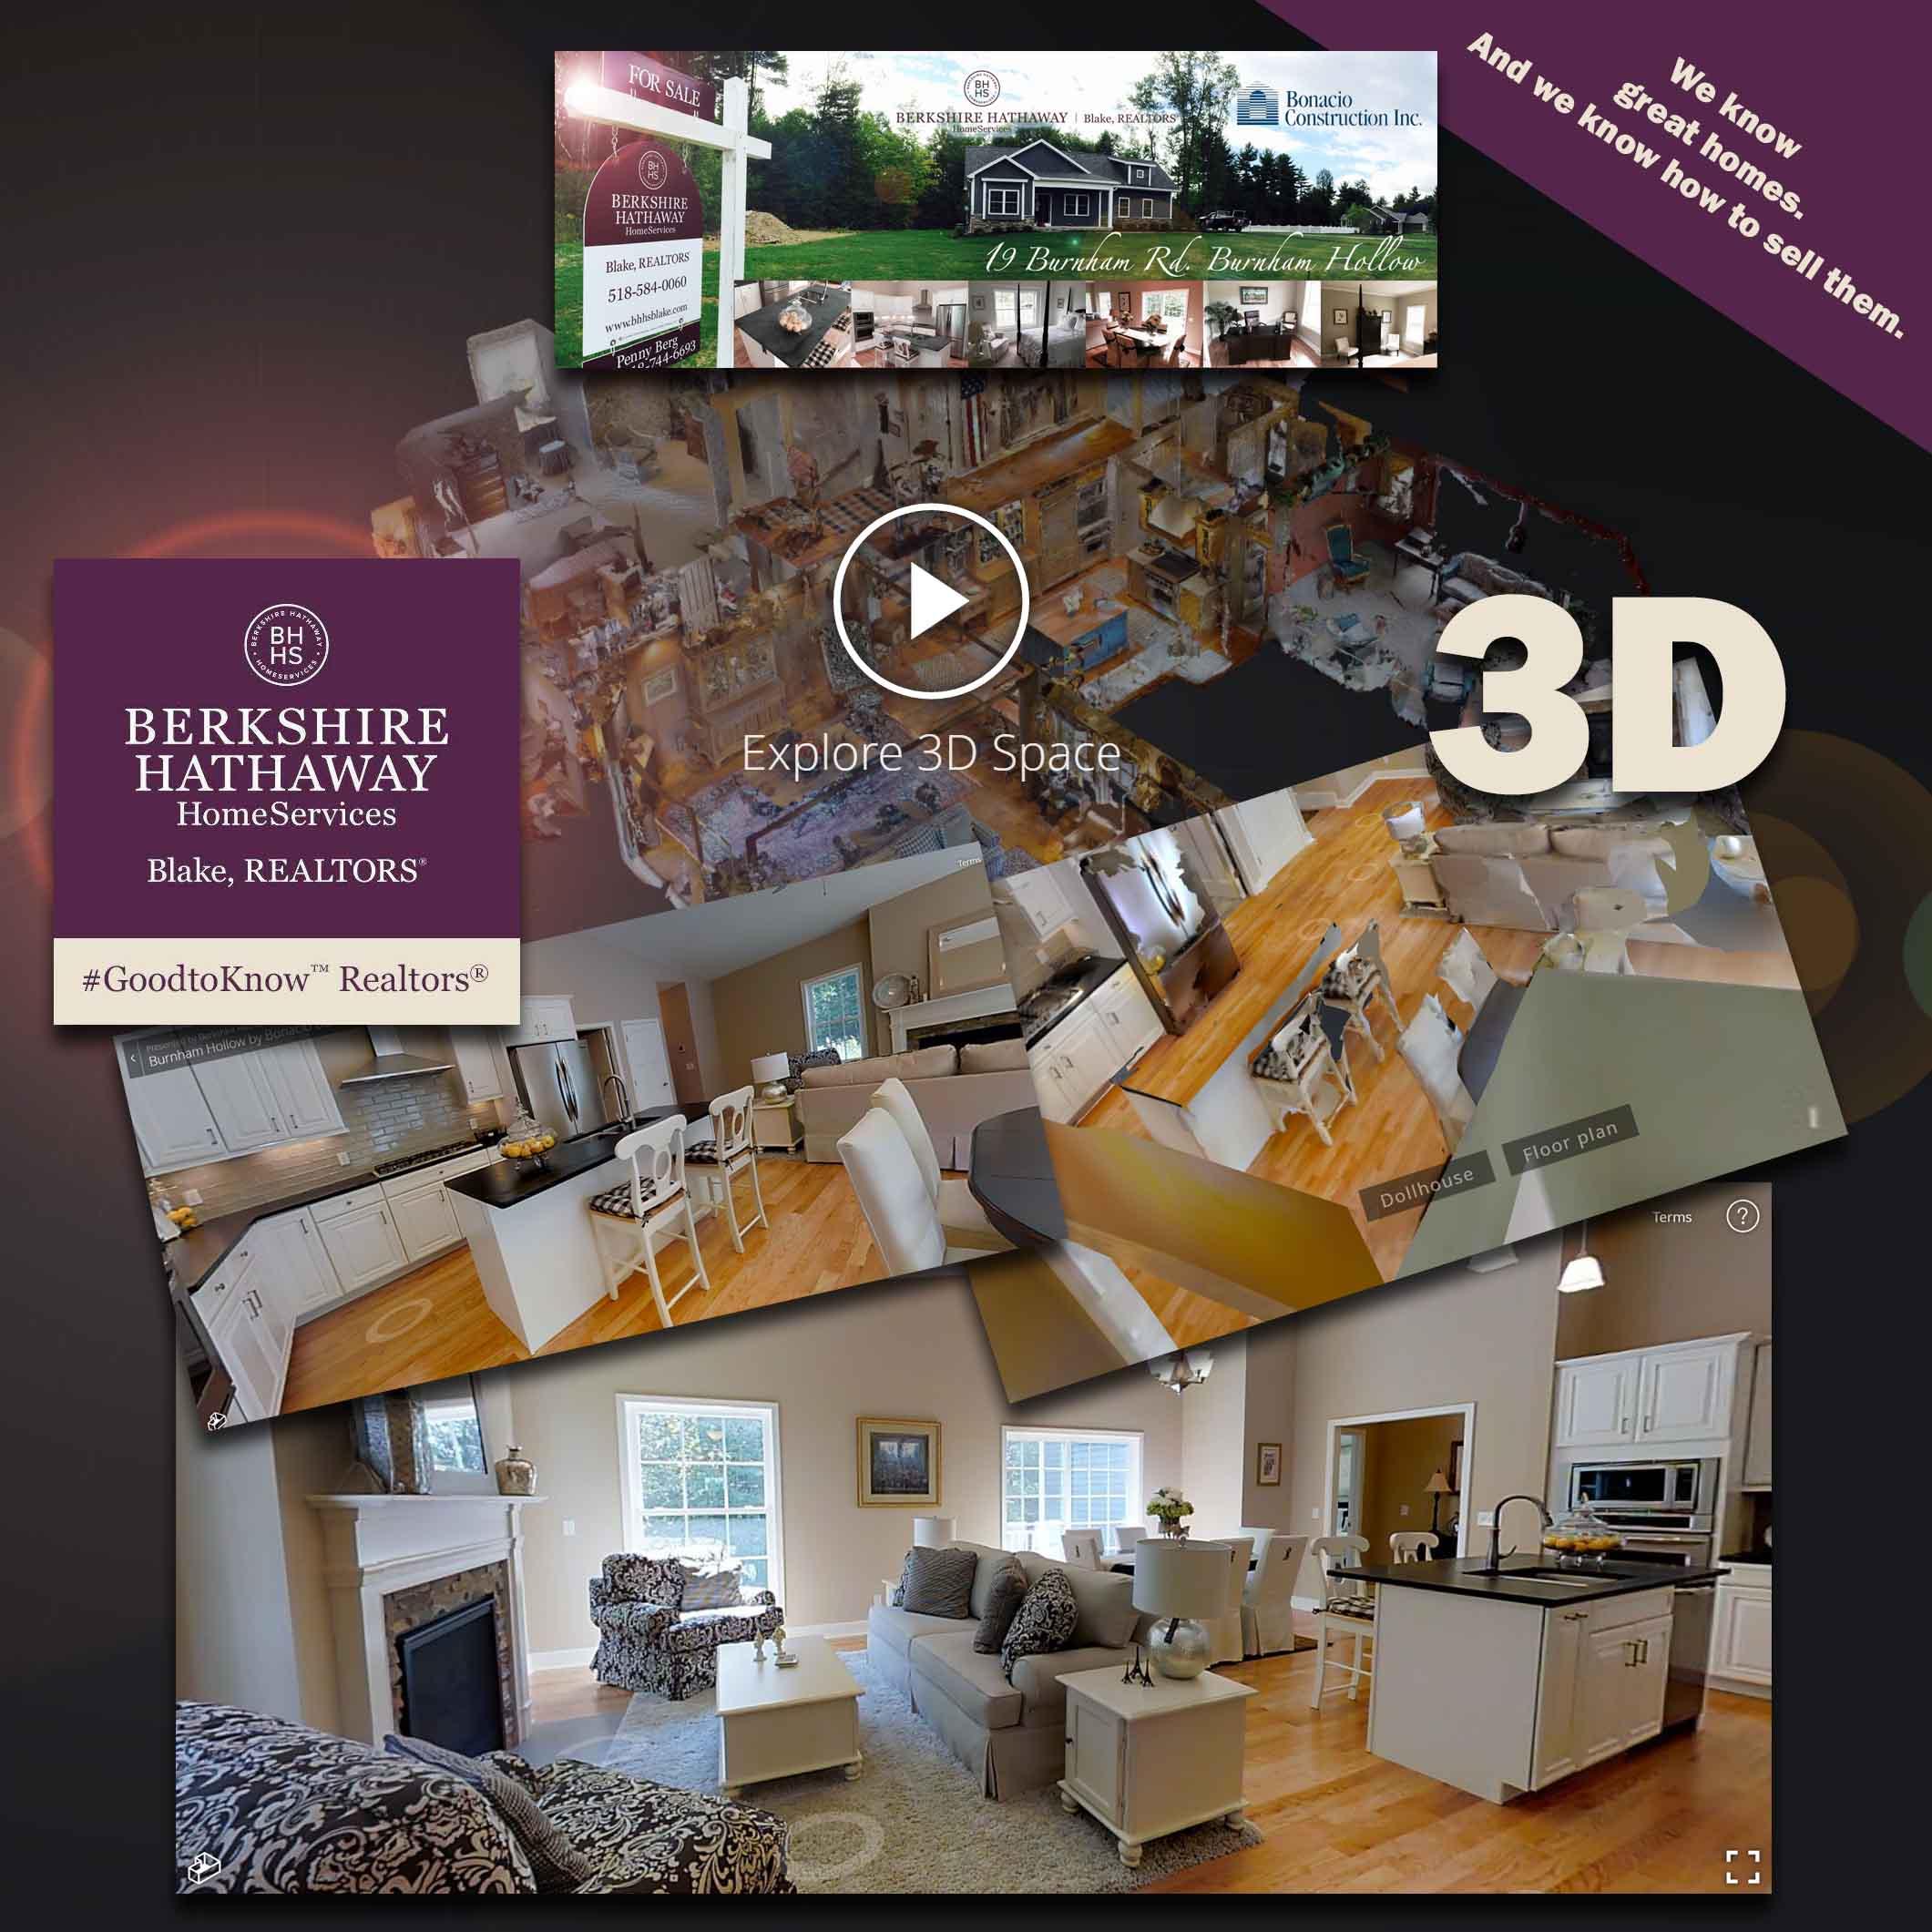 Preview the model in our Burnham Hollow Development  (Bonacio built new construction in Wilton).